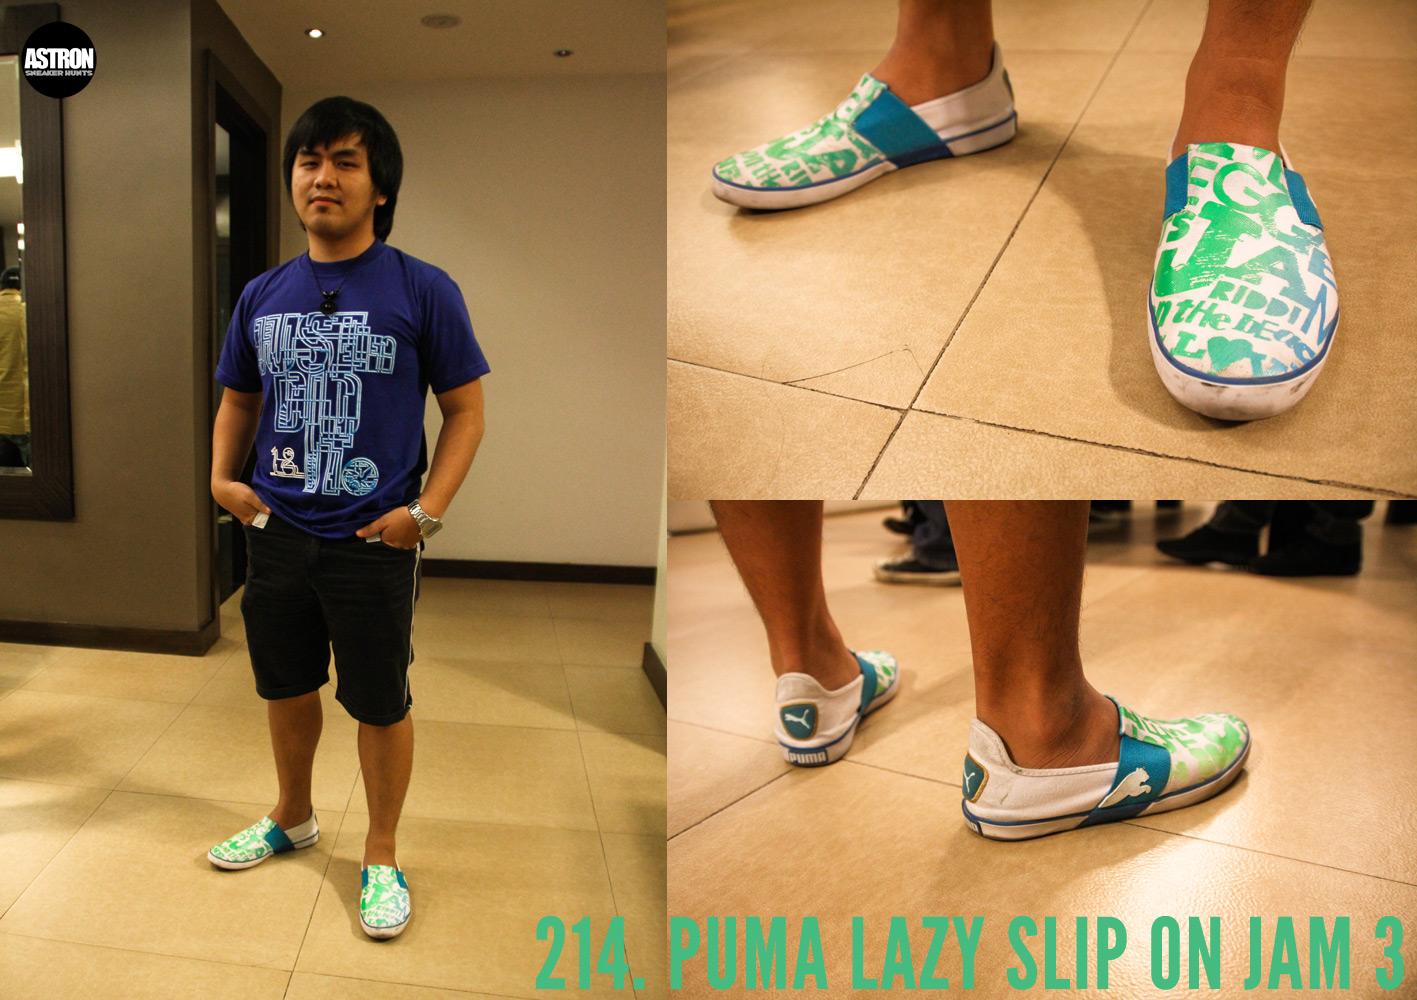 348efa26ab35 Astron Sneaker Hunts  214. Puma Lazy Slip On Jam 3